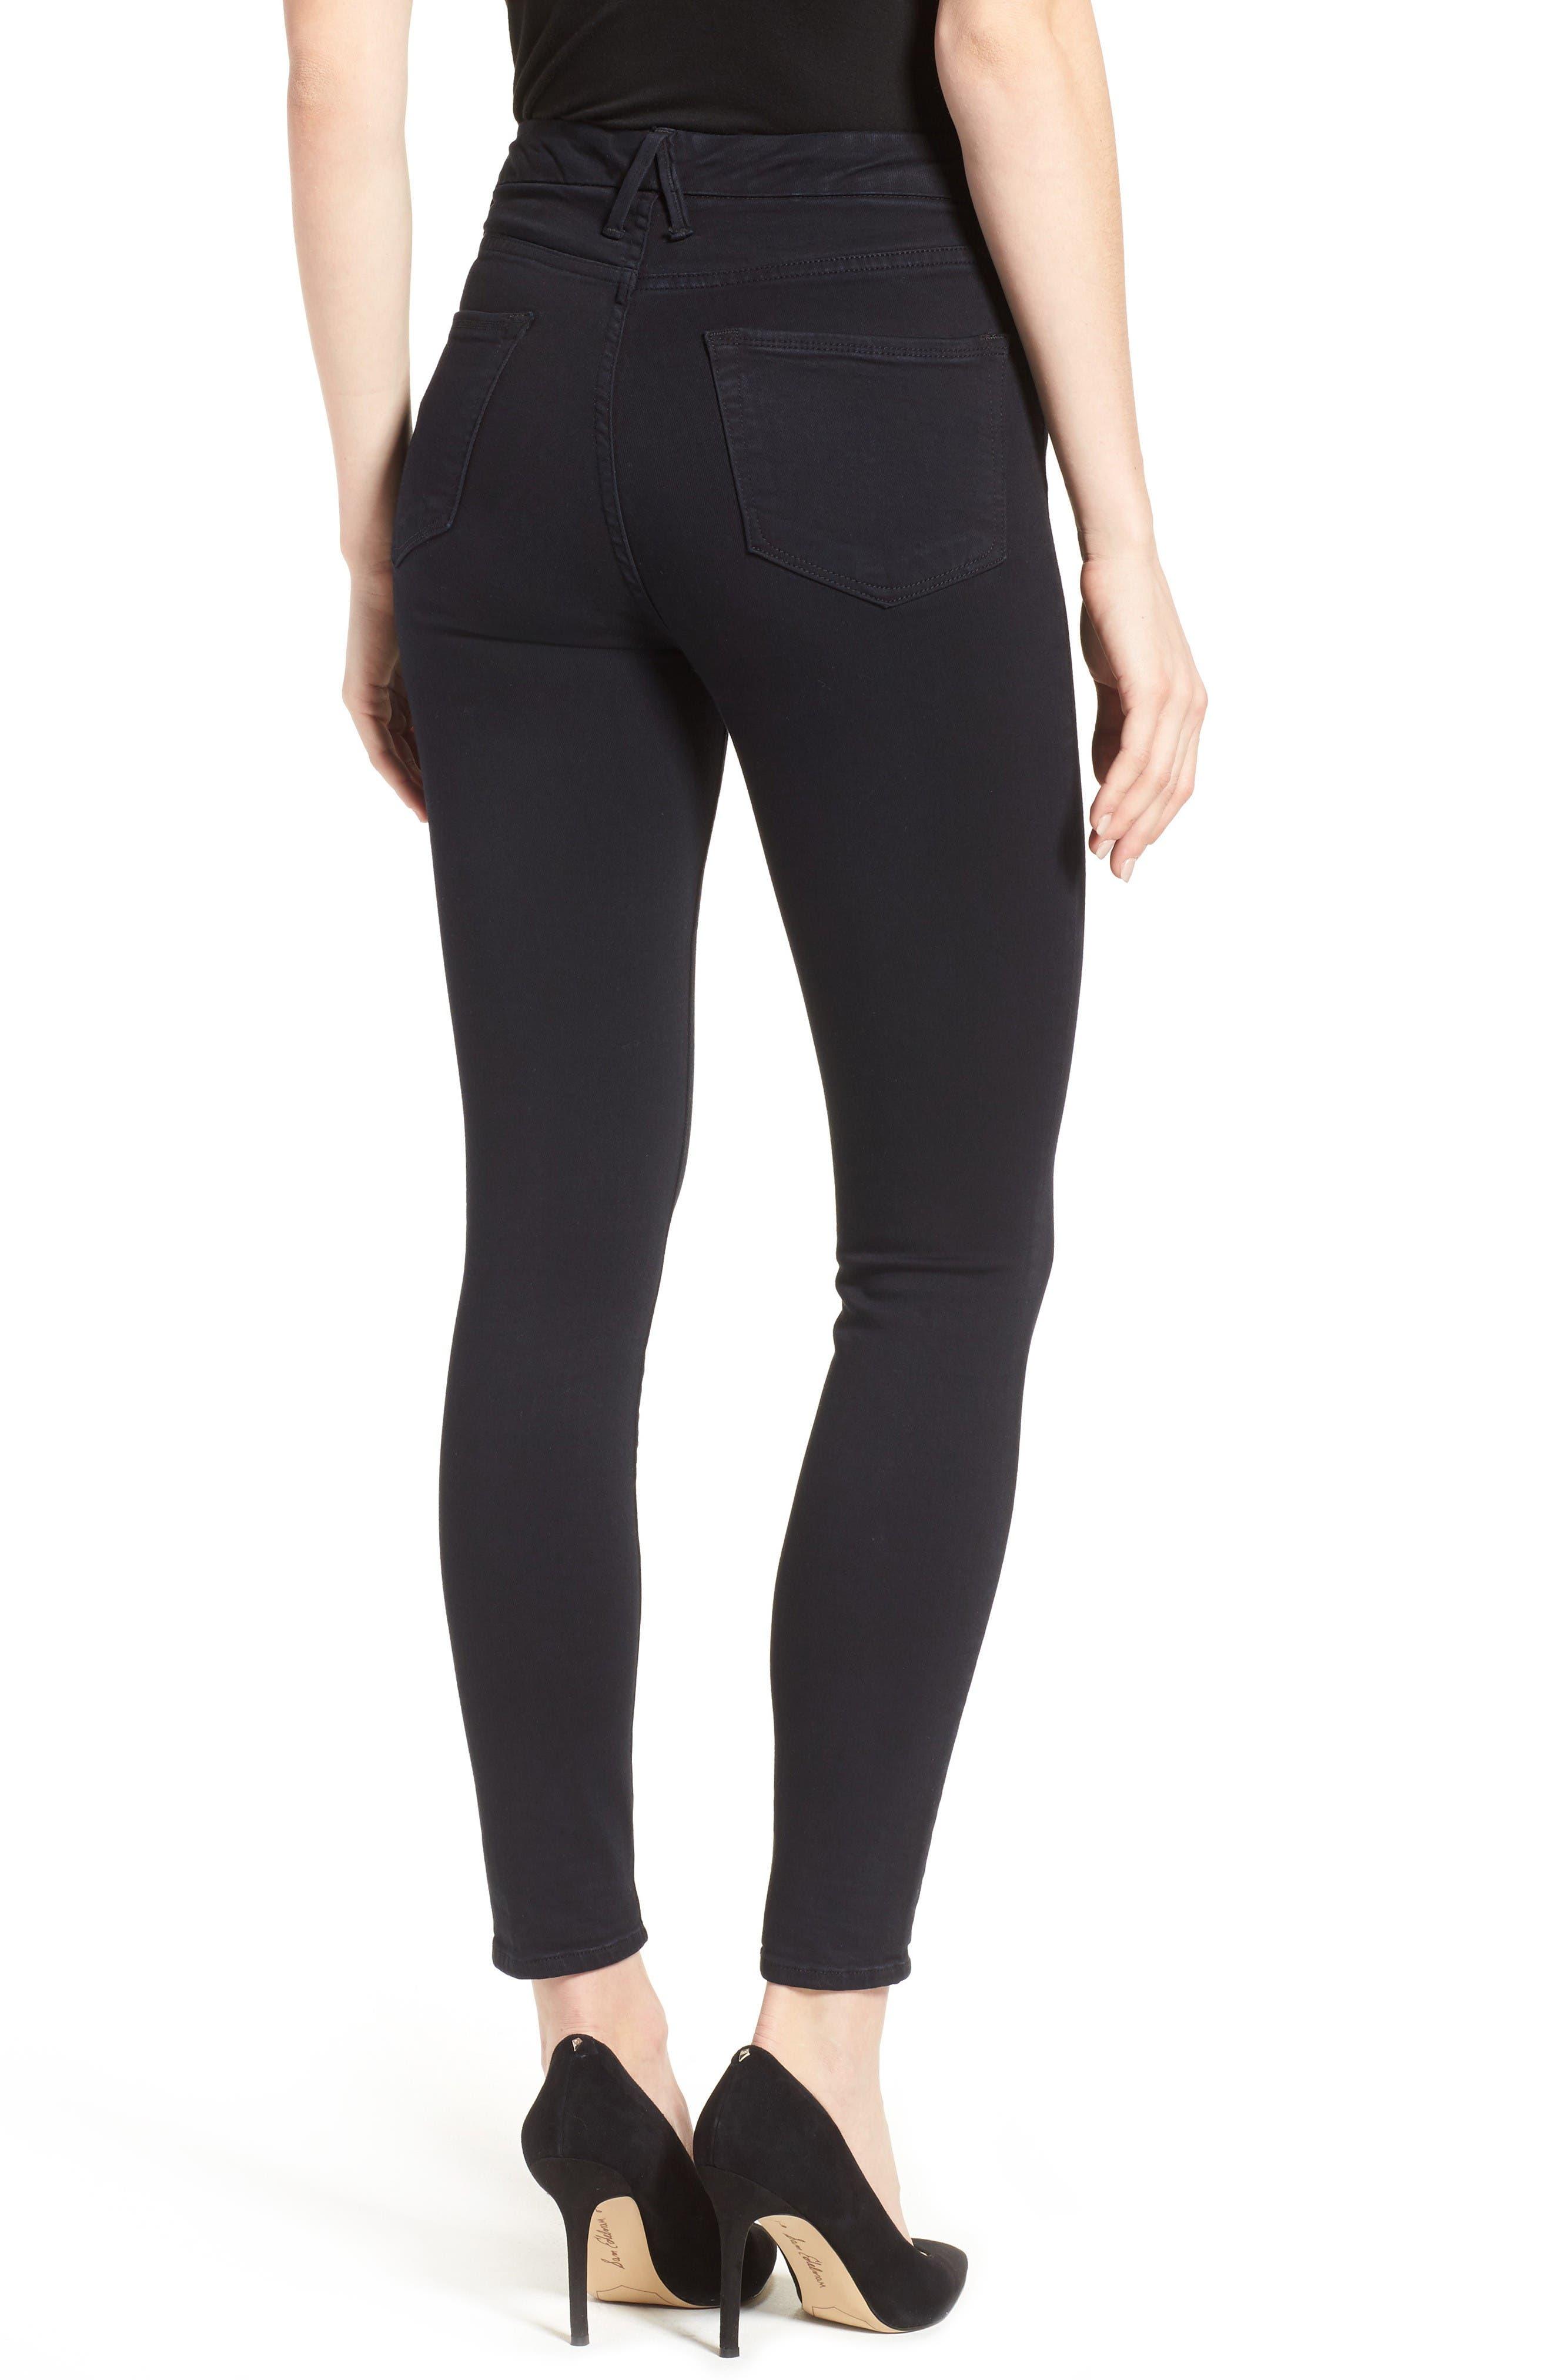 Alternate Image 2  - Good American Good Waist High Rise Skinny Jeans (Black 004)